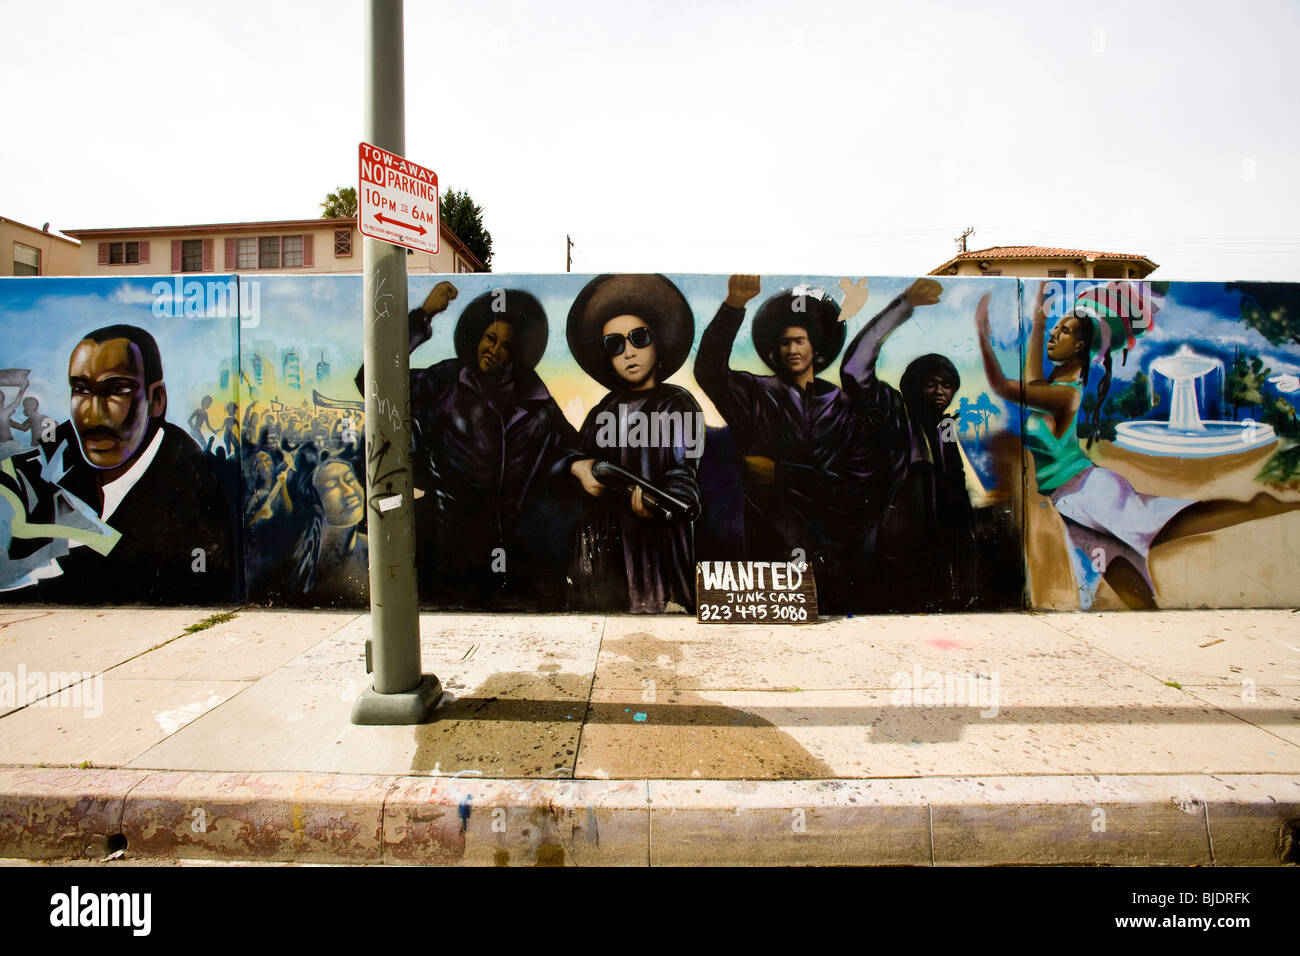 The Crenshaw Wall, Inglewood, Los Angeles County, California - Stock Image